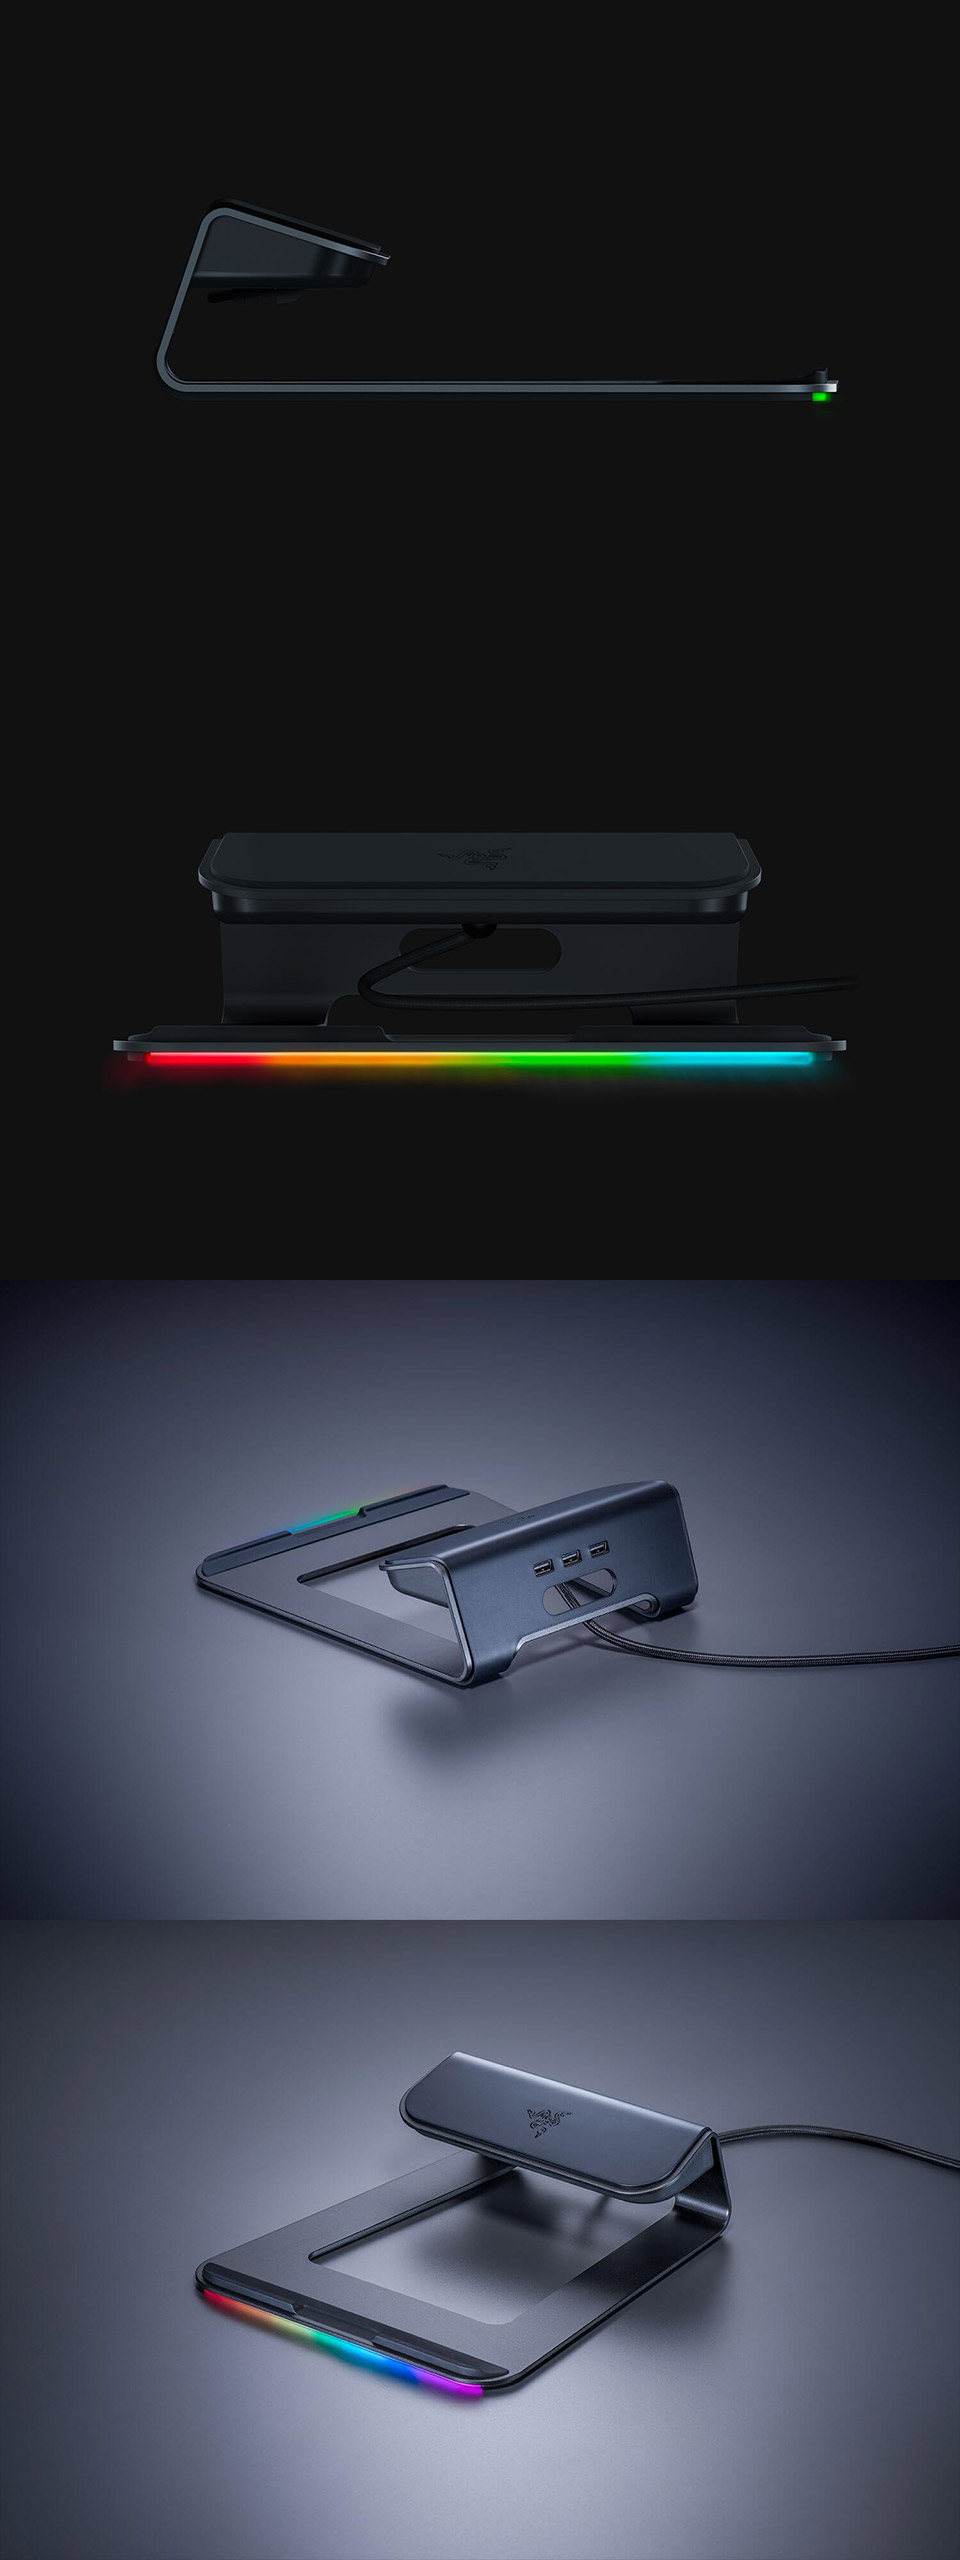 Buy Razer Chroma Laptop Stand Rc21 01110200 Pc Case